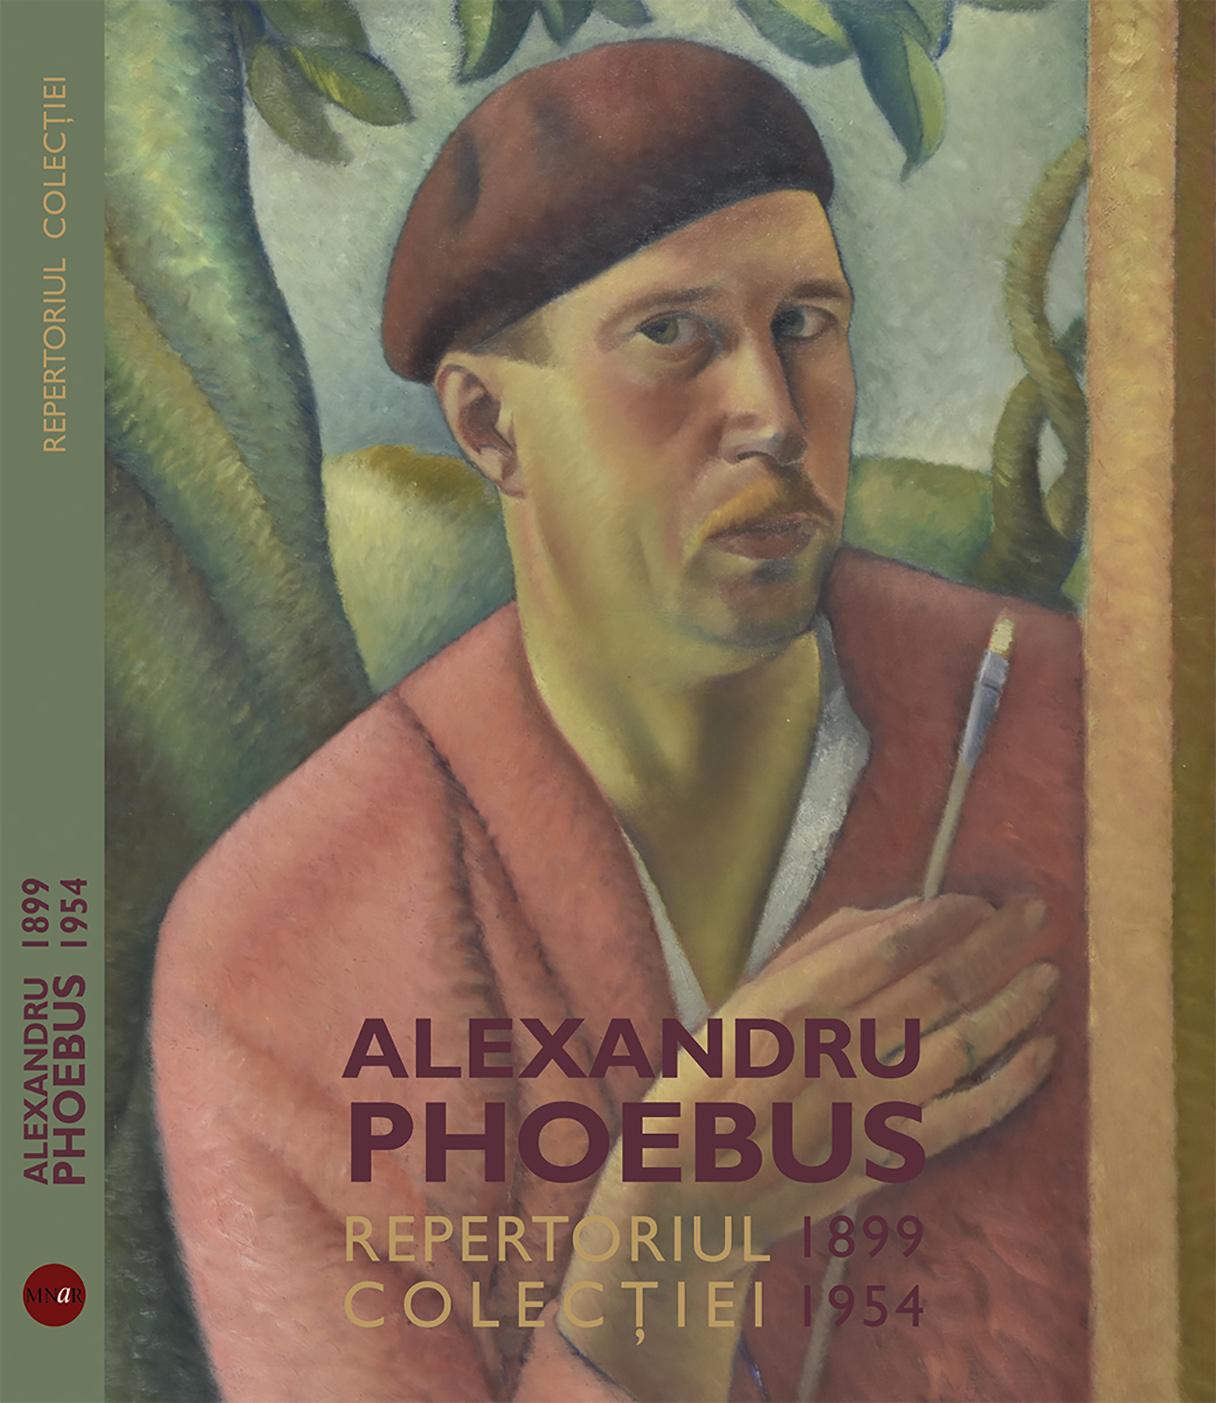 Alexandru Phoebus 1899 – 1954